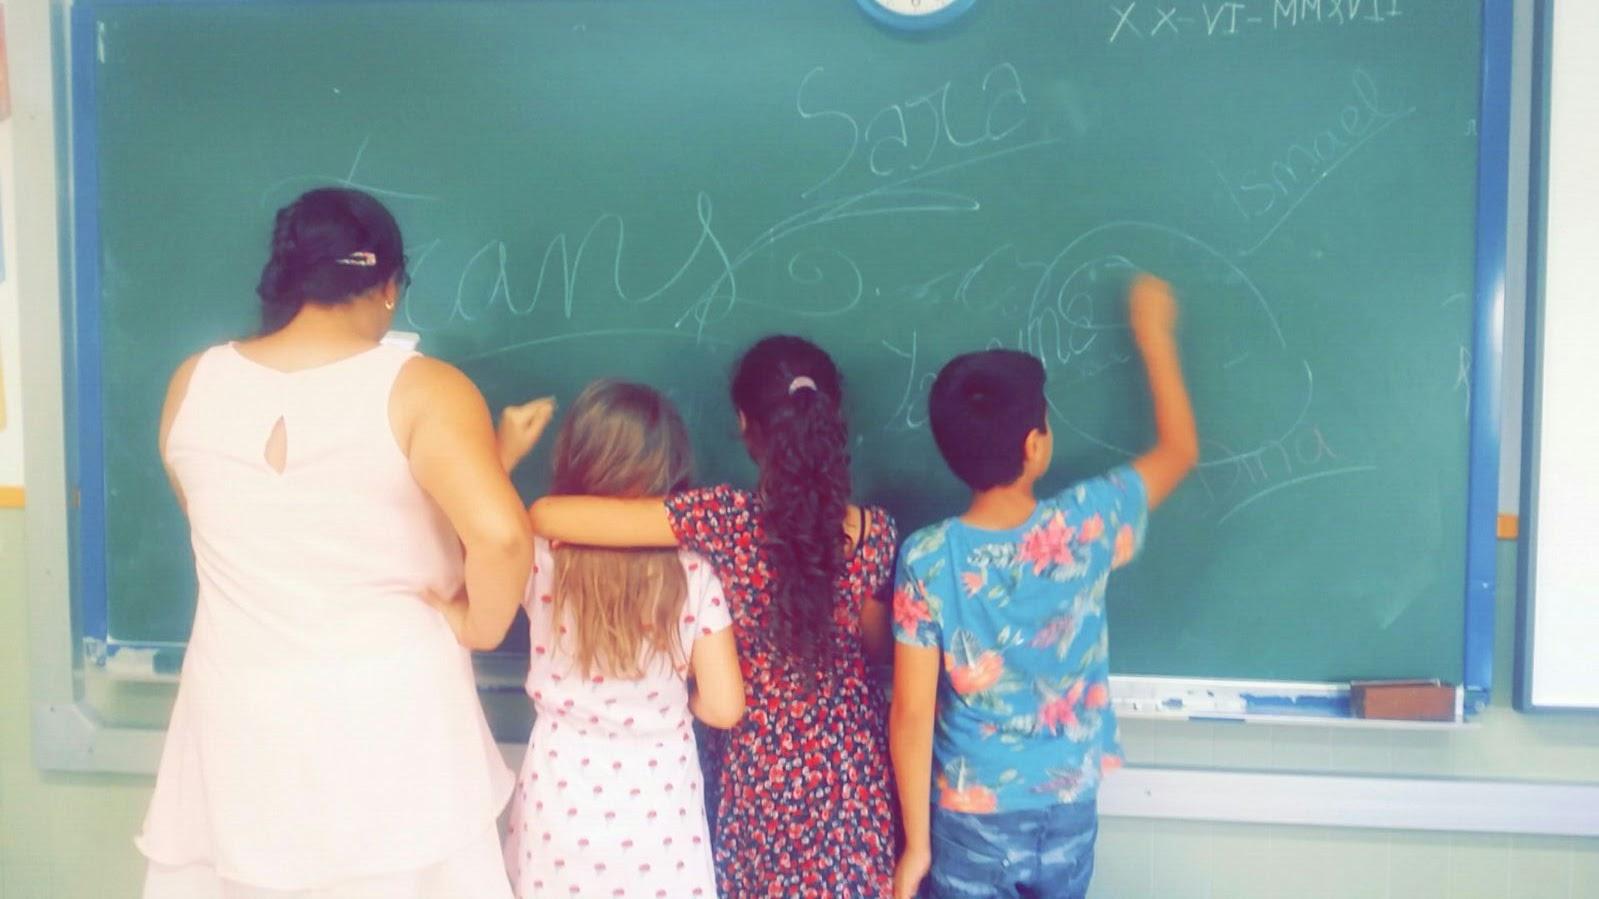 TRANS - Refuerzo Educativo. Mis niños